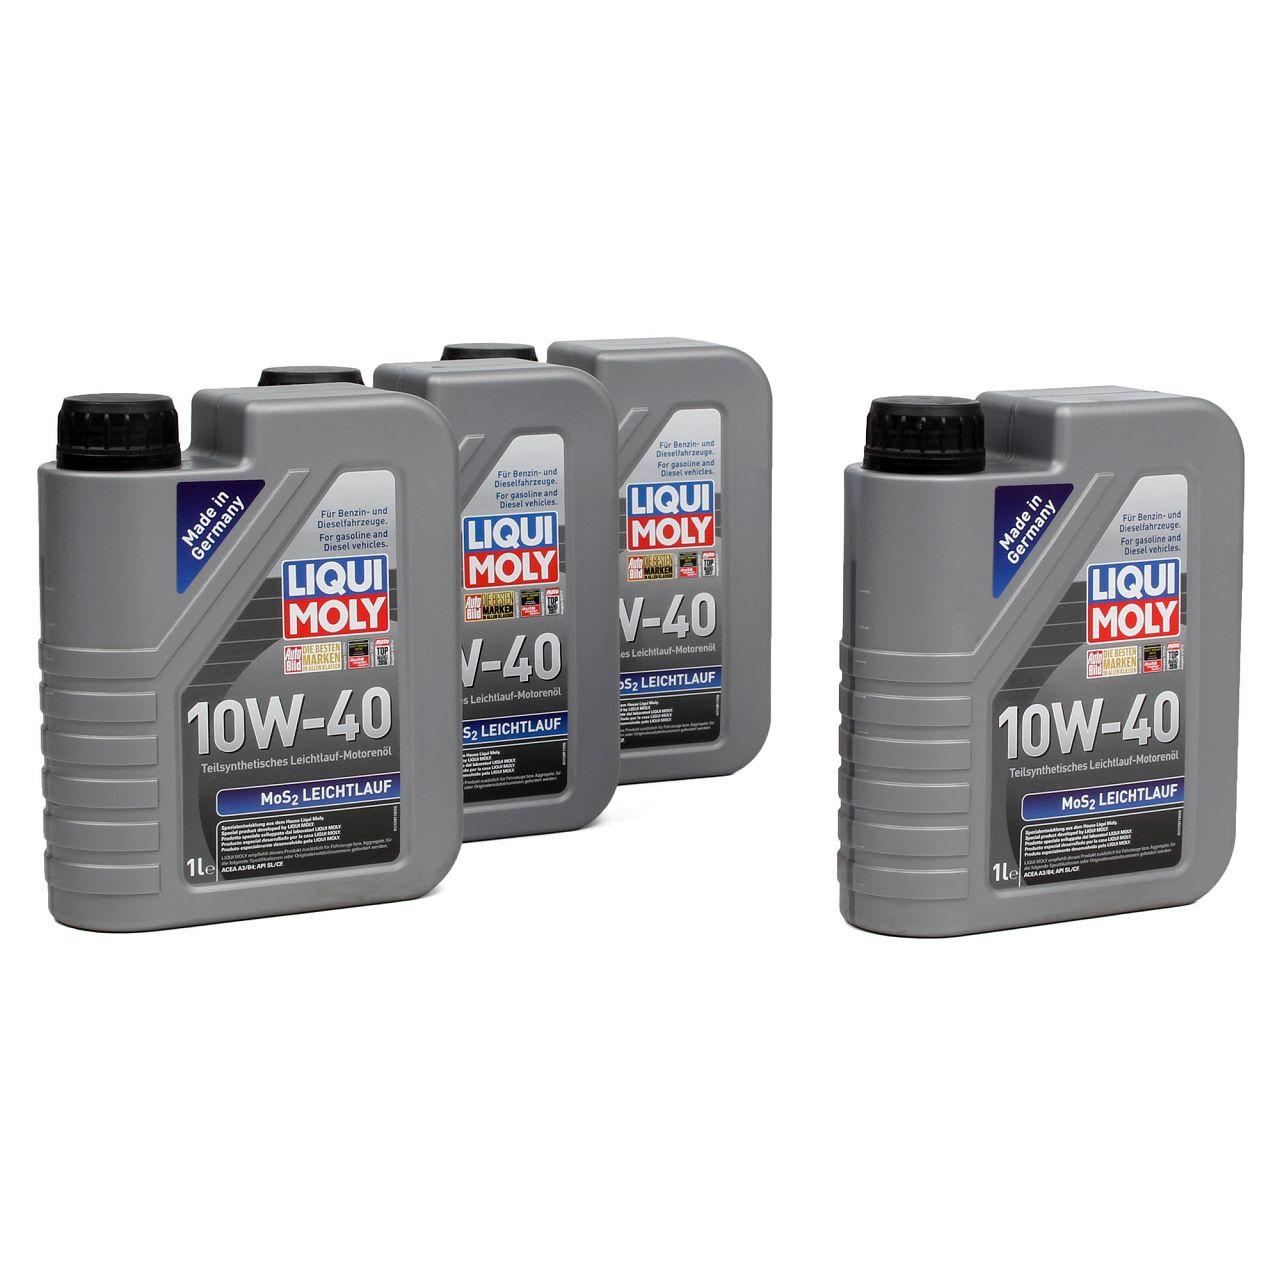 LIQUI MOLY Motoröl Öl MoS2 LEICHTLAUF 10W40 10W-40 4L 4Liter 1091